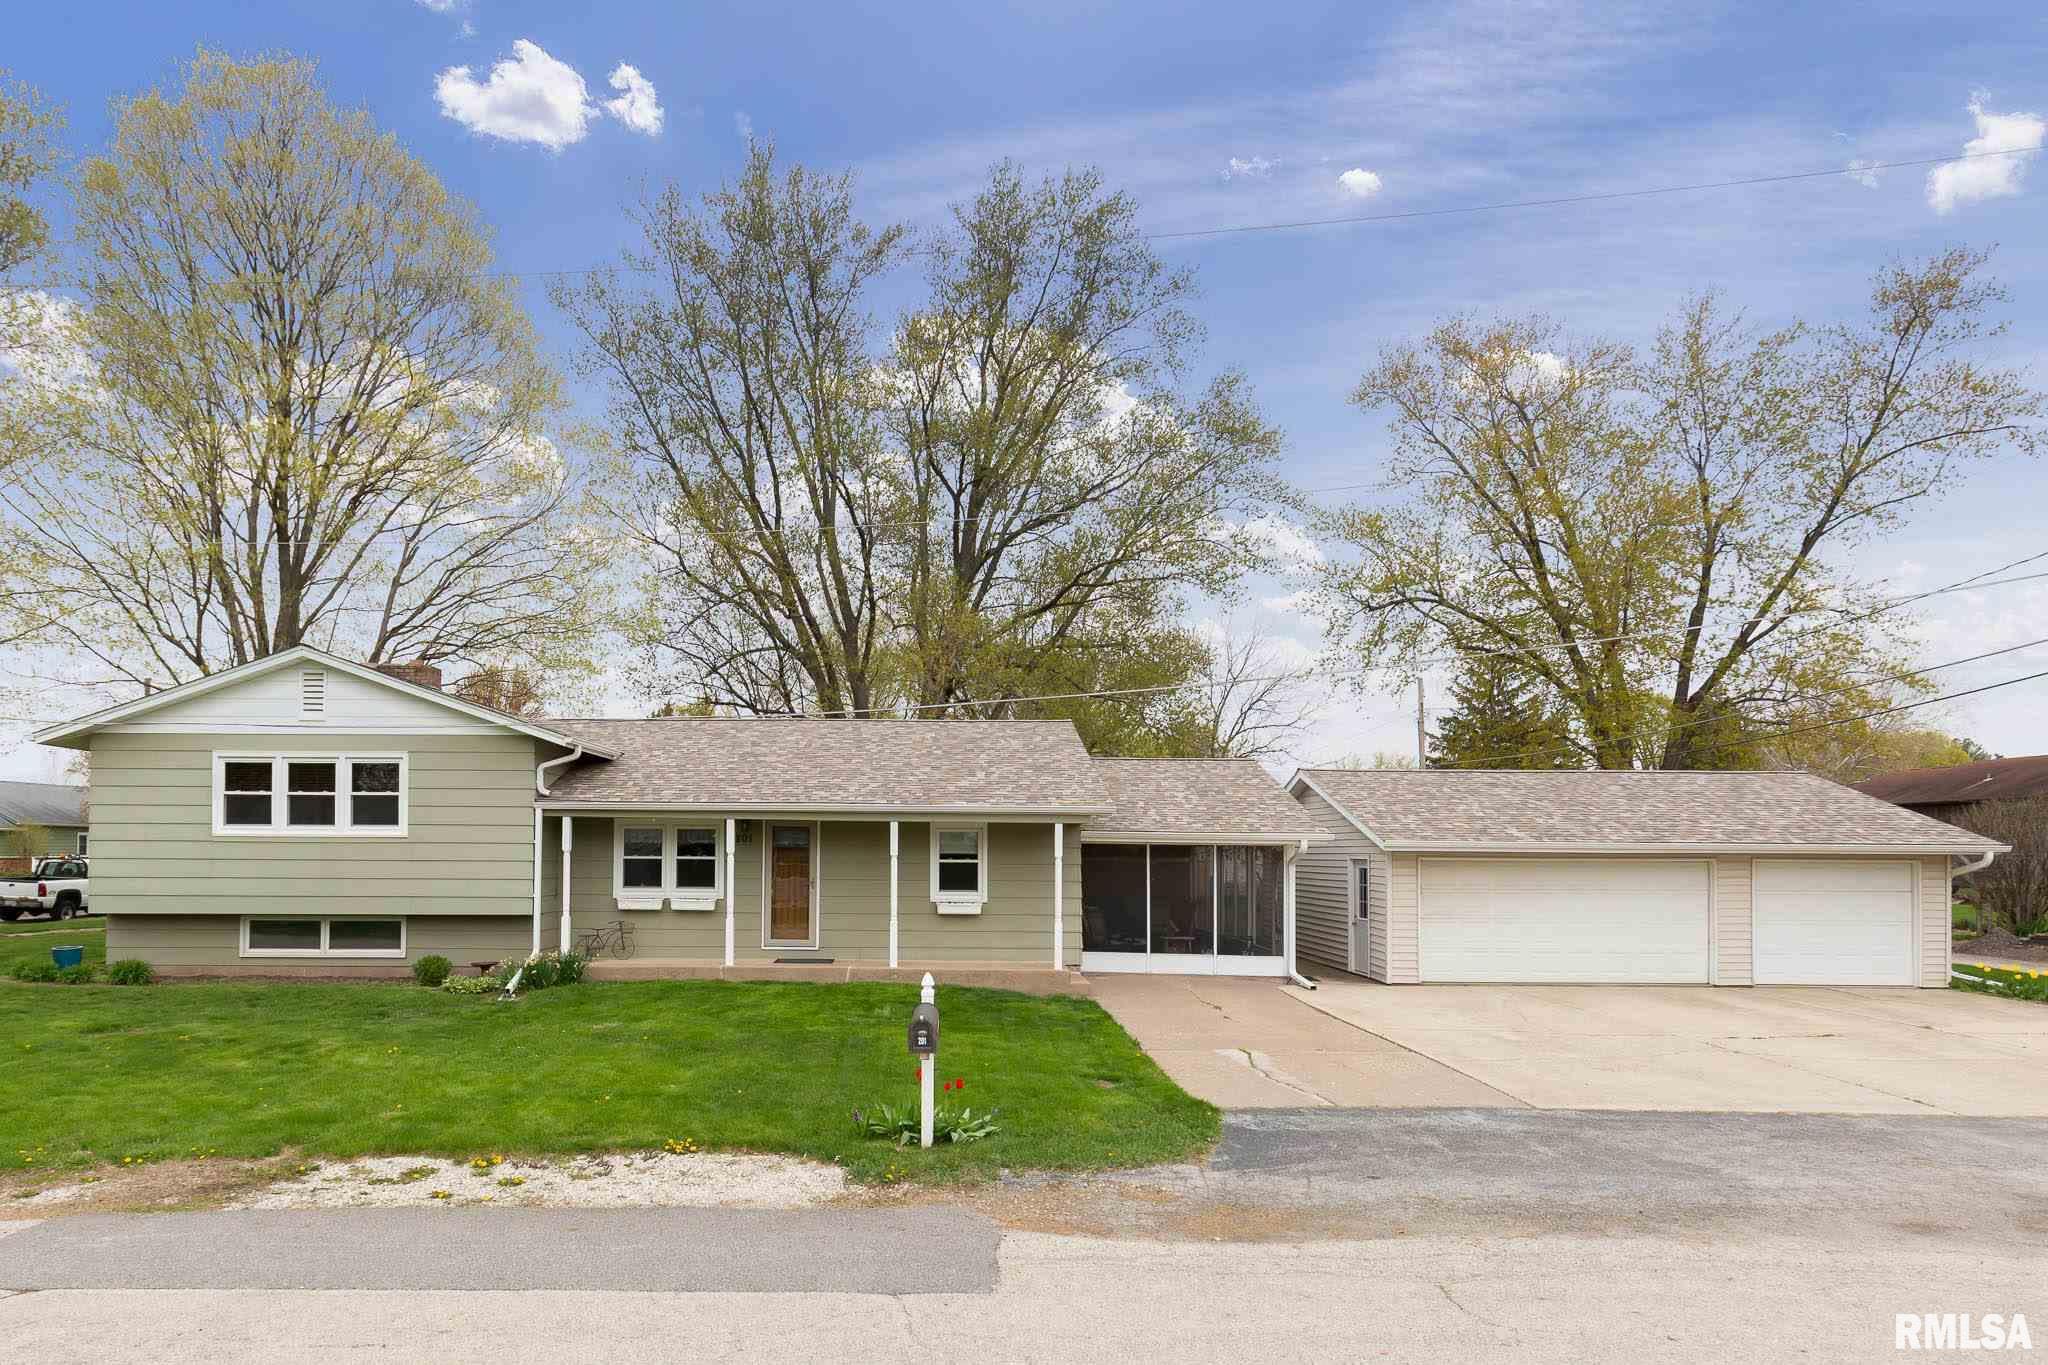 201 5TH Property Photo - Hampton, IL real estate listing